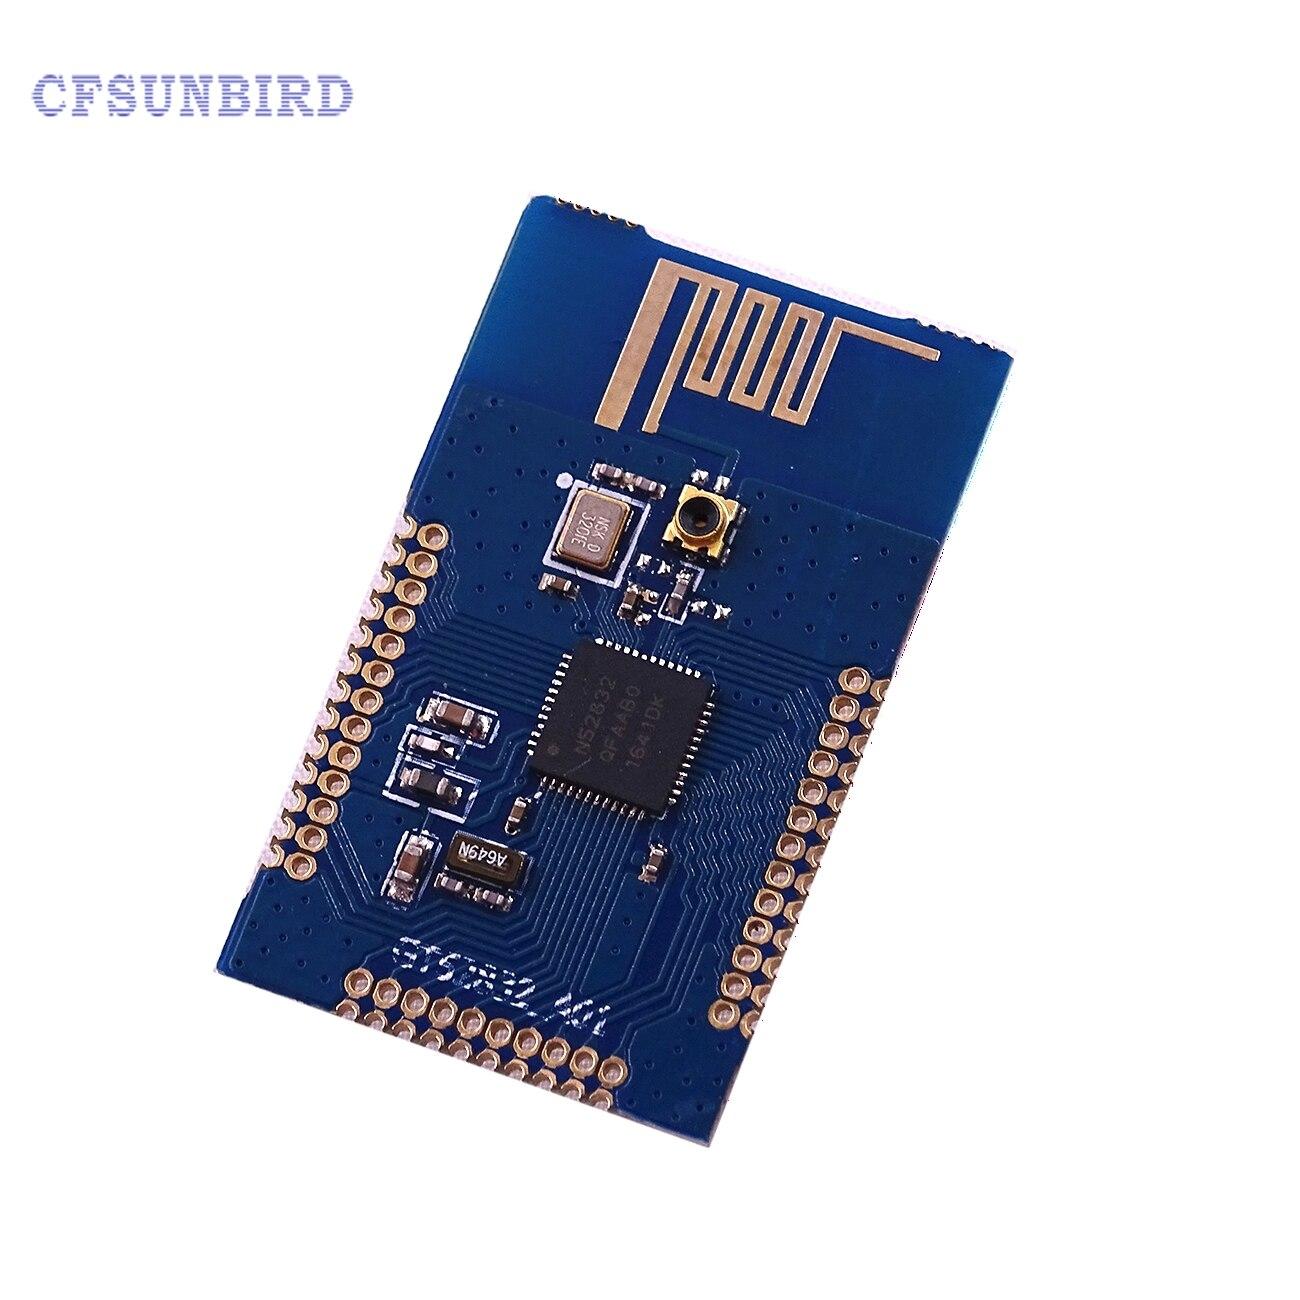 все цены на  1pcs NRF52832 Bluetooth module, M4 kernel, Bluetooth 4.1BLE module  онлайн